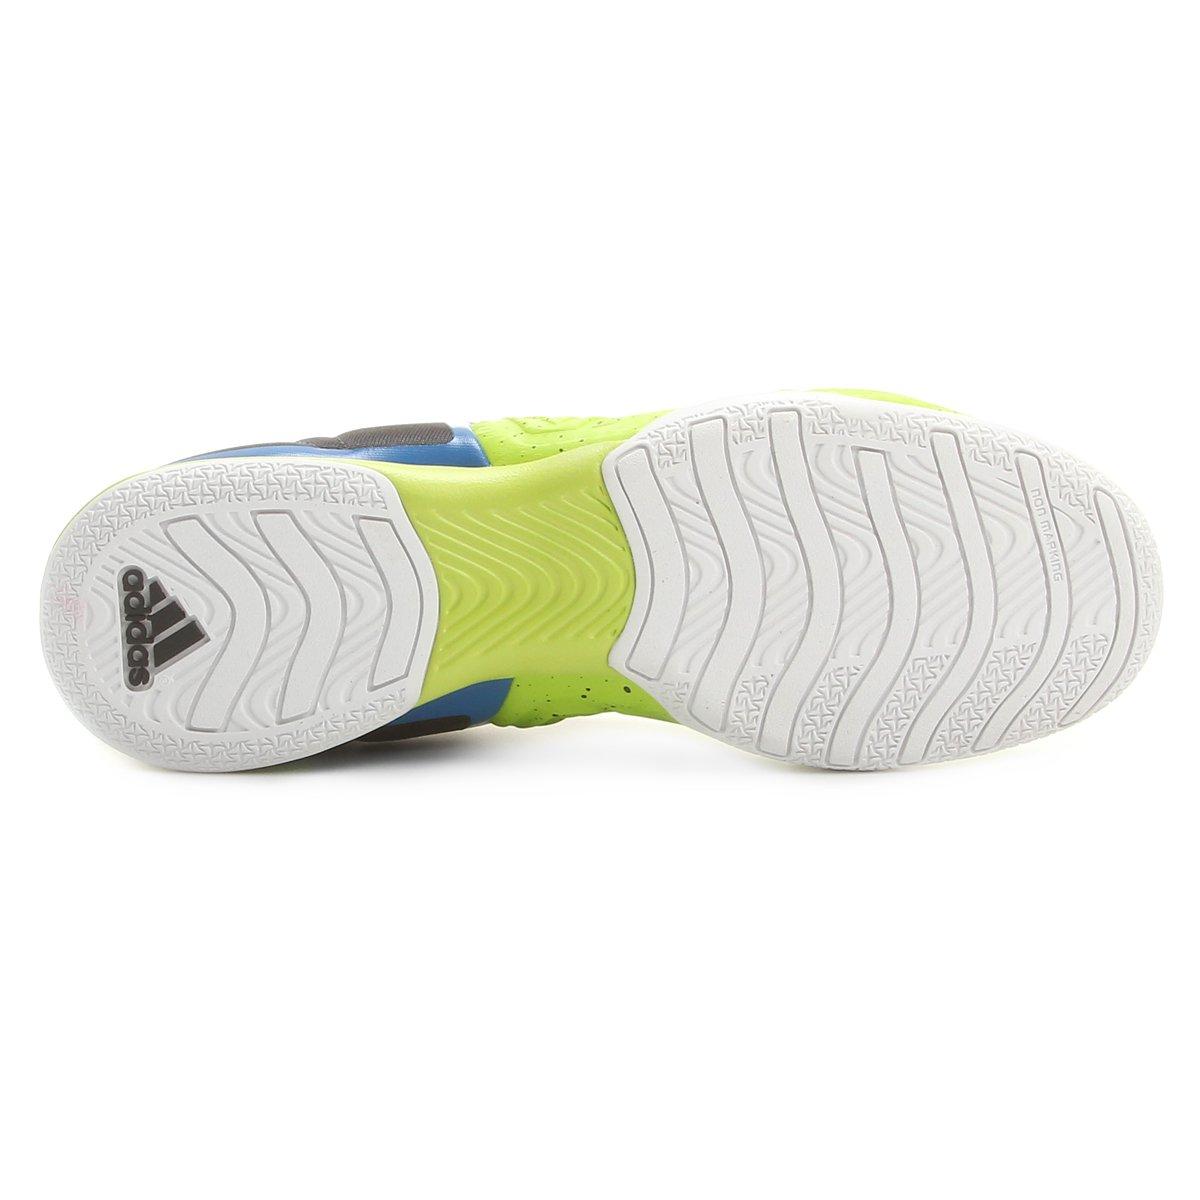 Chuteira Futsal Adidas X 15 2 CT Masculina - Compre Agora  17a981745929c